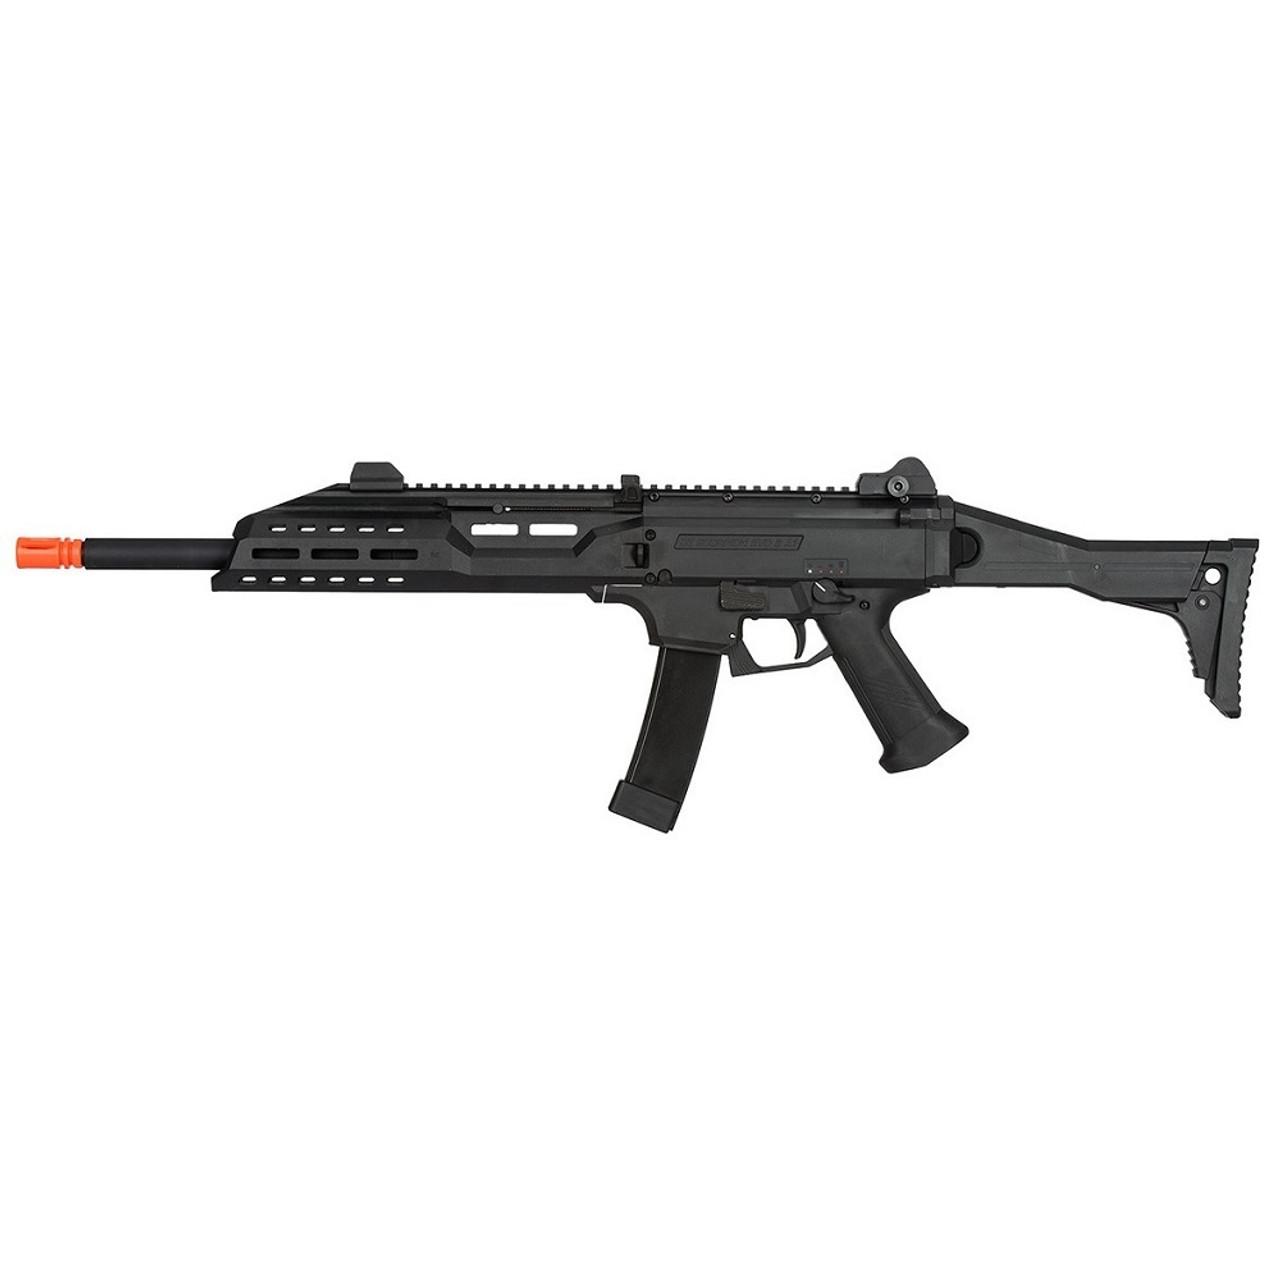 Scorpion / Evo Airsoft Guns